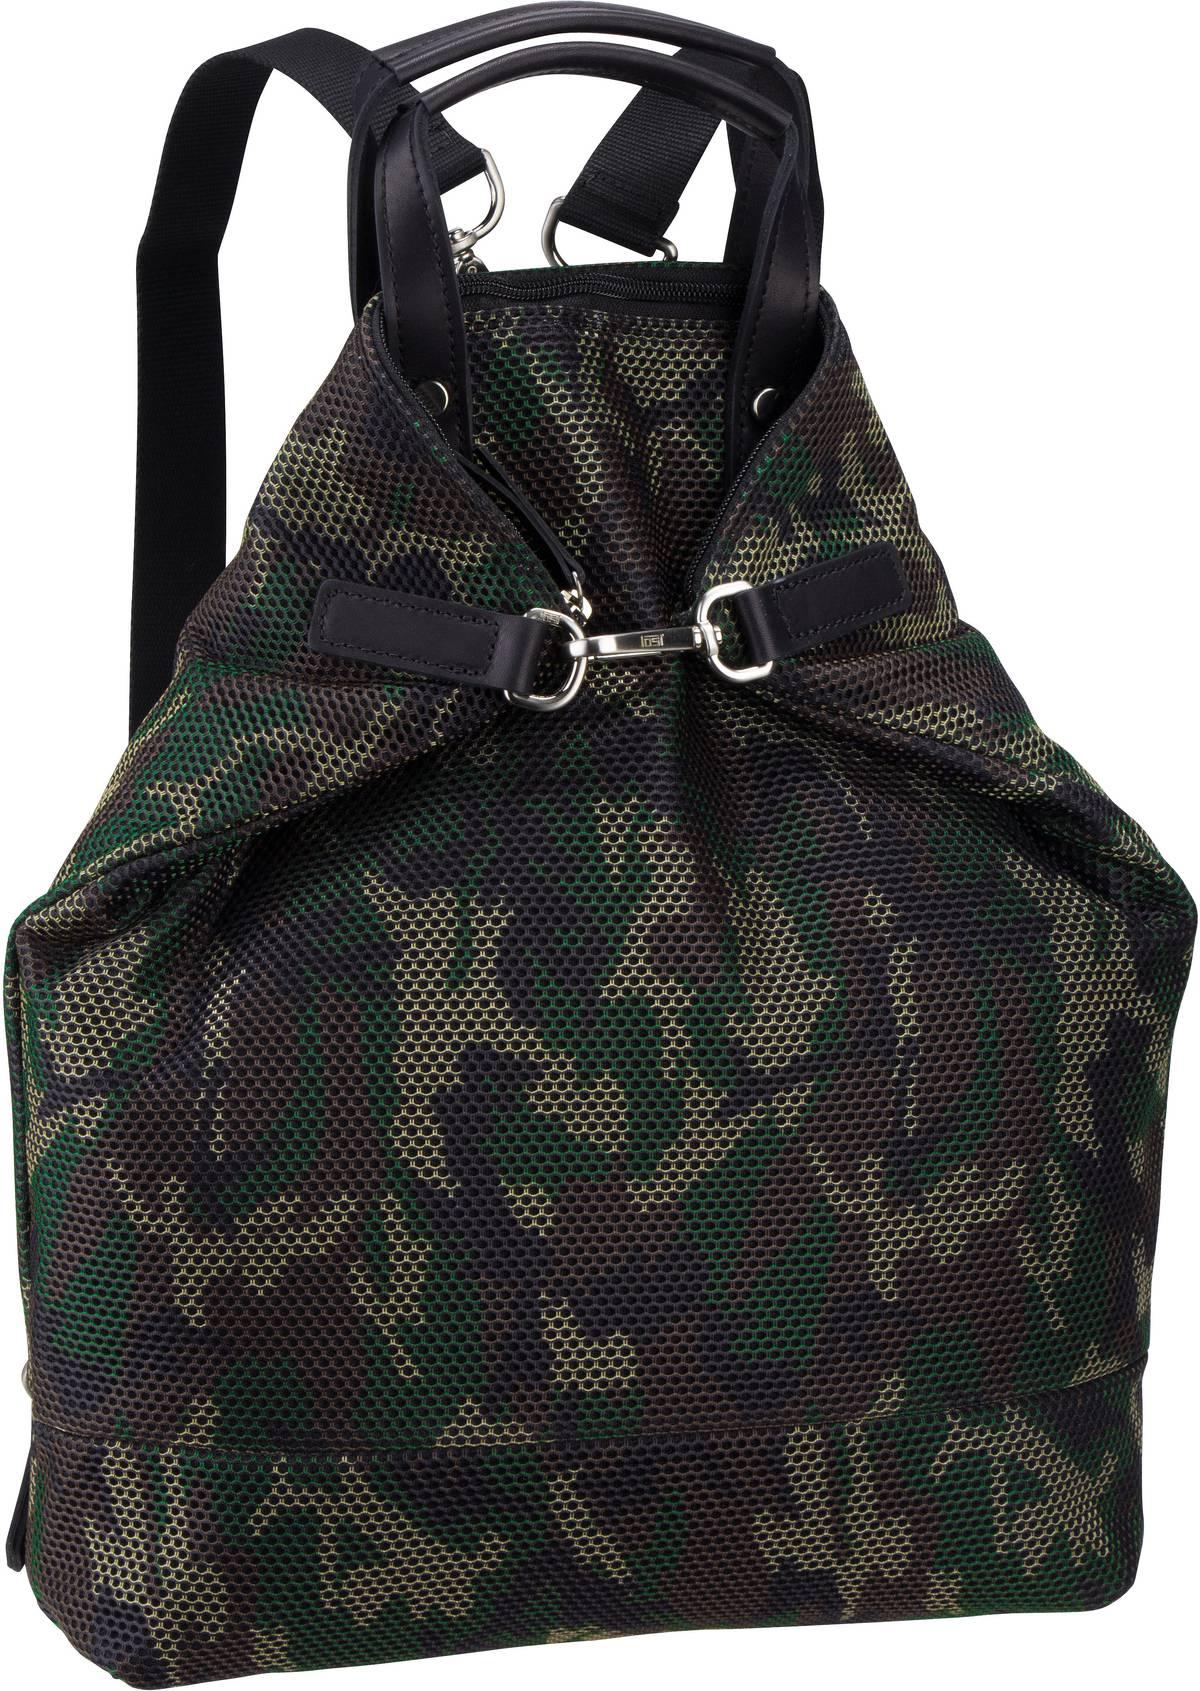 Rucksack / Daypack Mesh 6178 X-Change 3in1 Bag S Camouflage